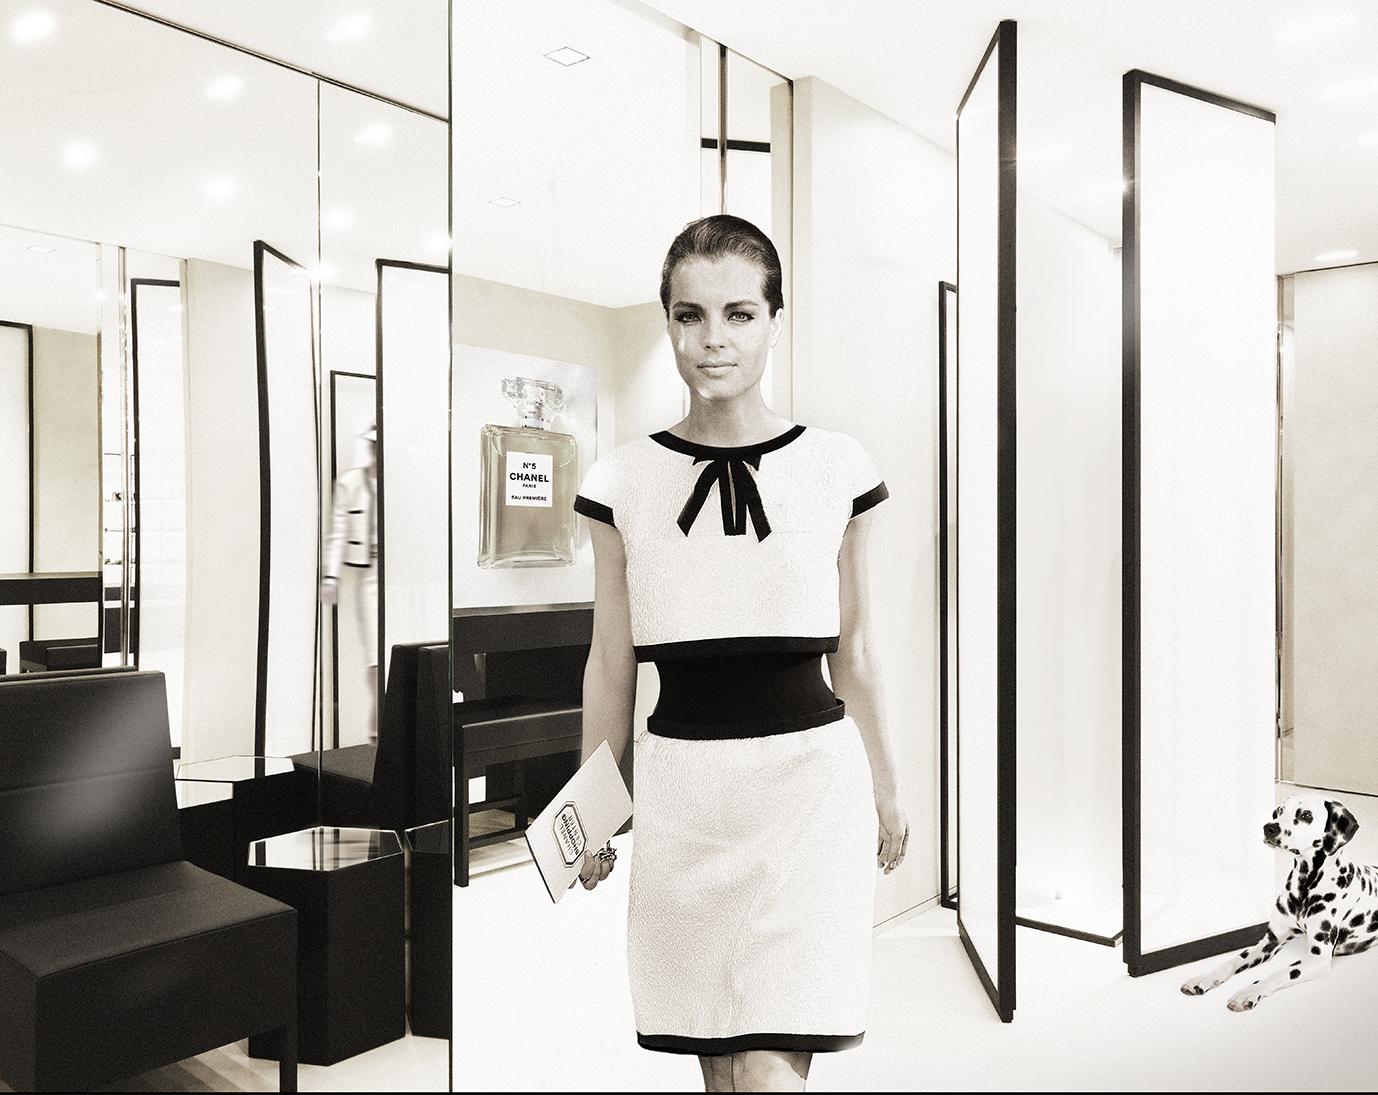 axel-crieger-2016-Hommage-de-Chanel-Fotocollage-auf-Museumweinwand-Edition-12